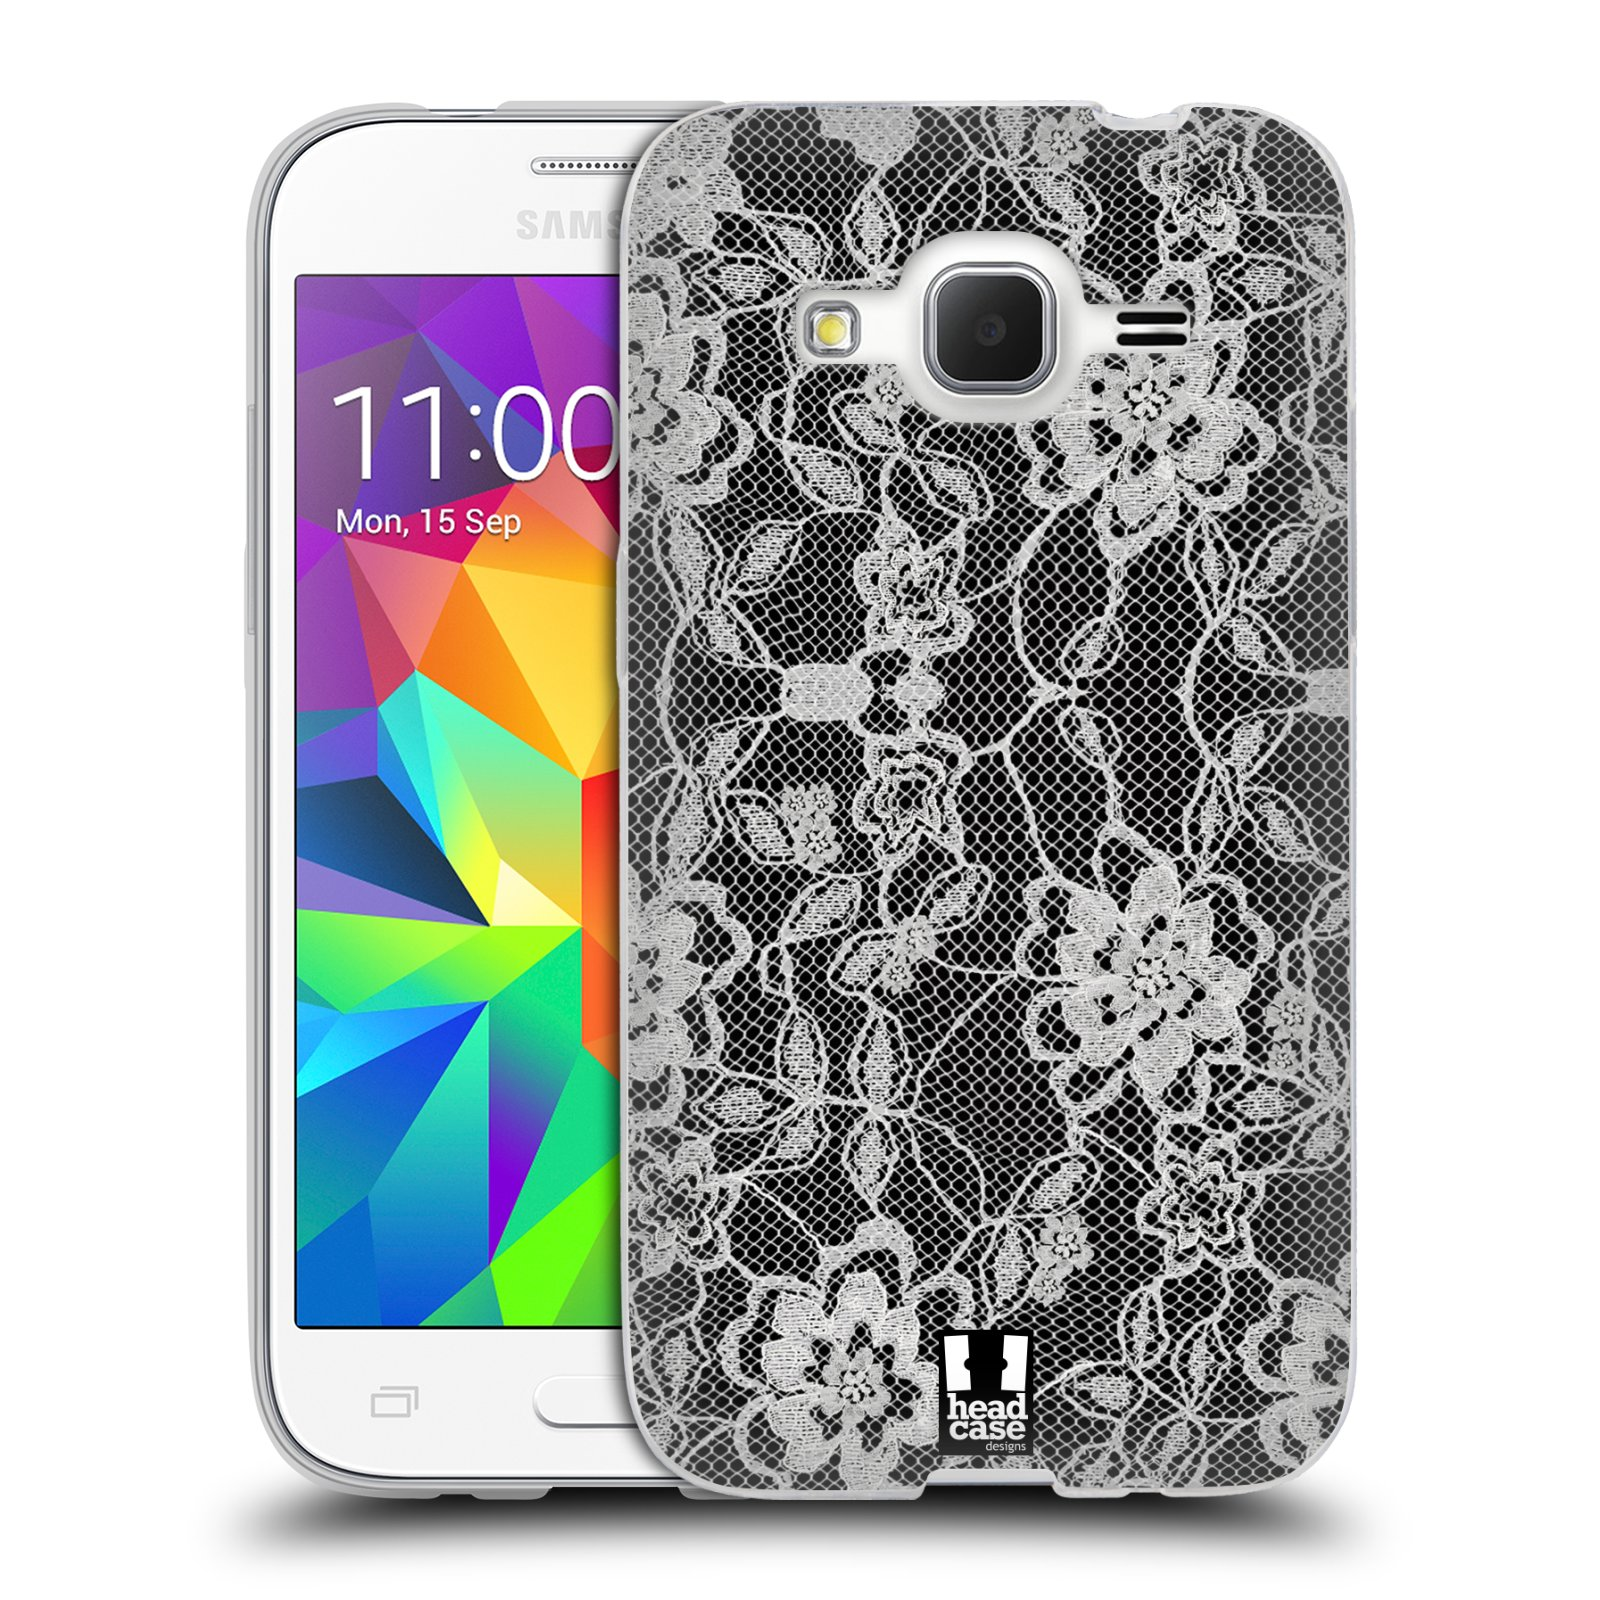 Silikonové pouzdro na mobil Samsung Galaxy Core Prime LTE HEAD CASE FLOWERY KRAJKA (Silikonový kryt či obal na mobilní telefon Samsung Galaxy Core Prime LTE SM-G360)